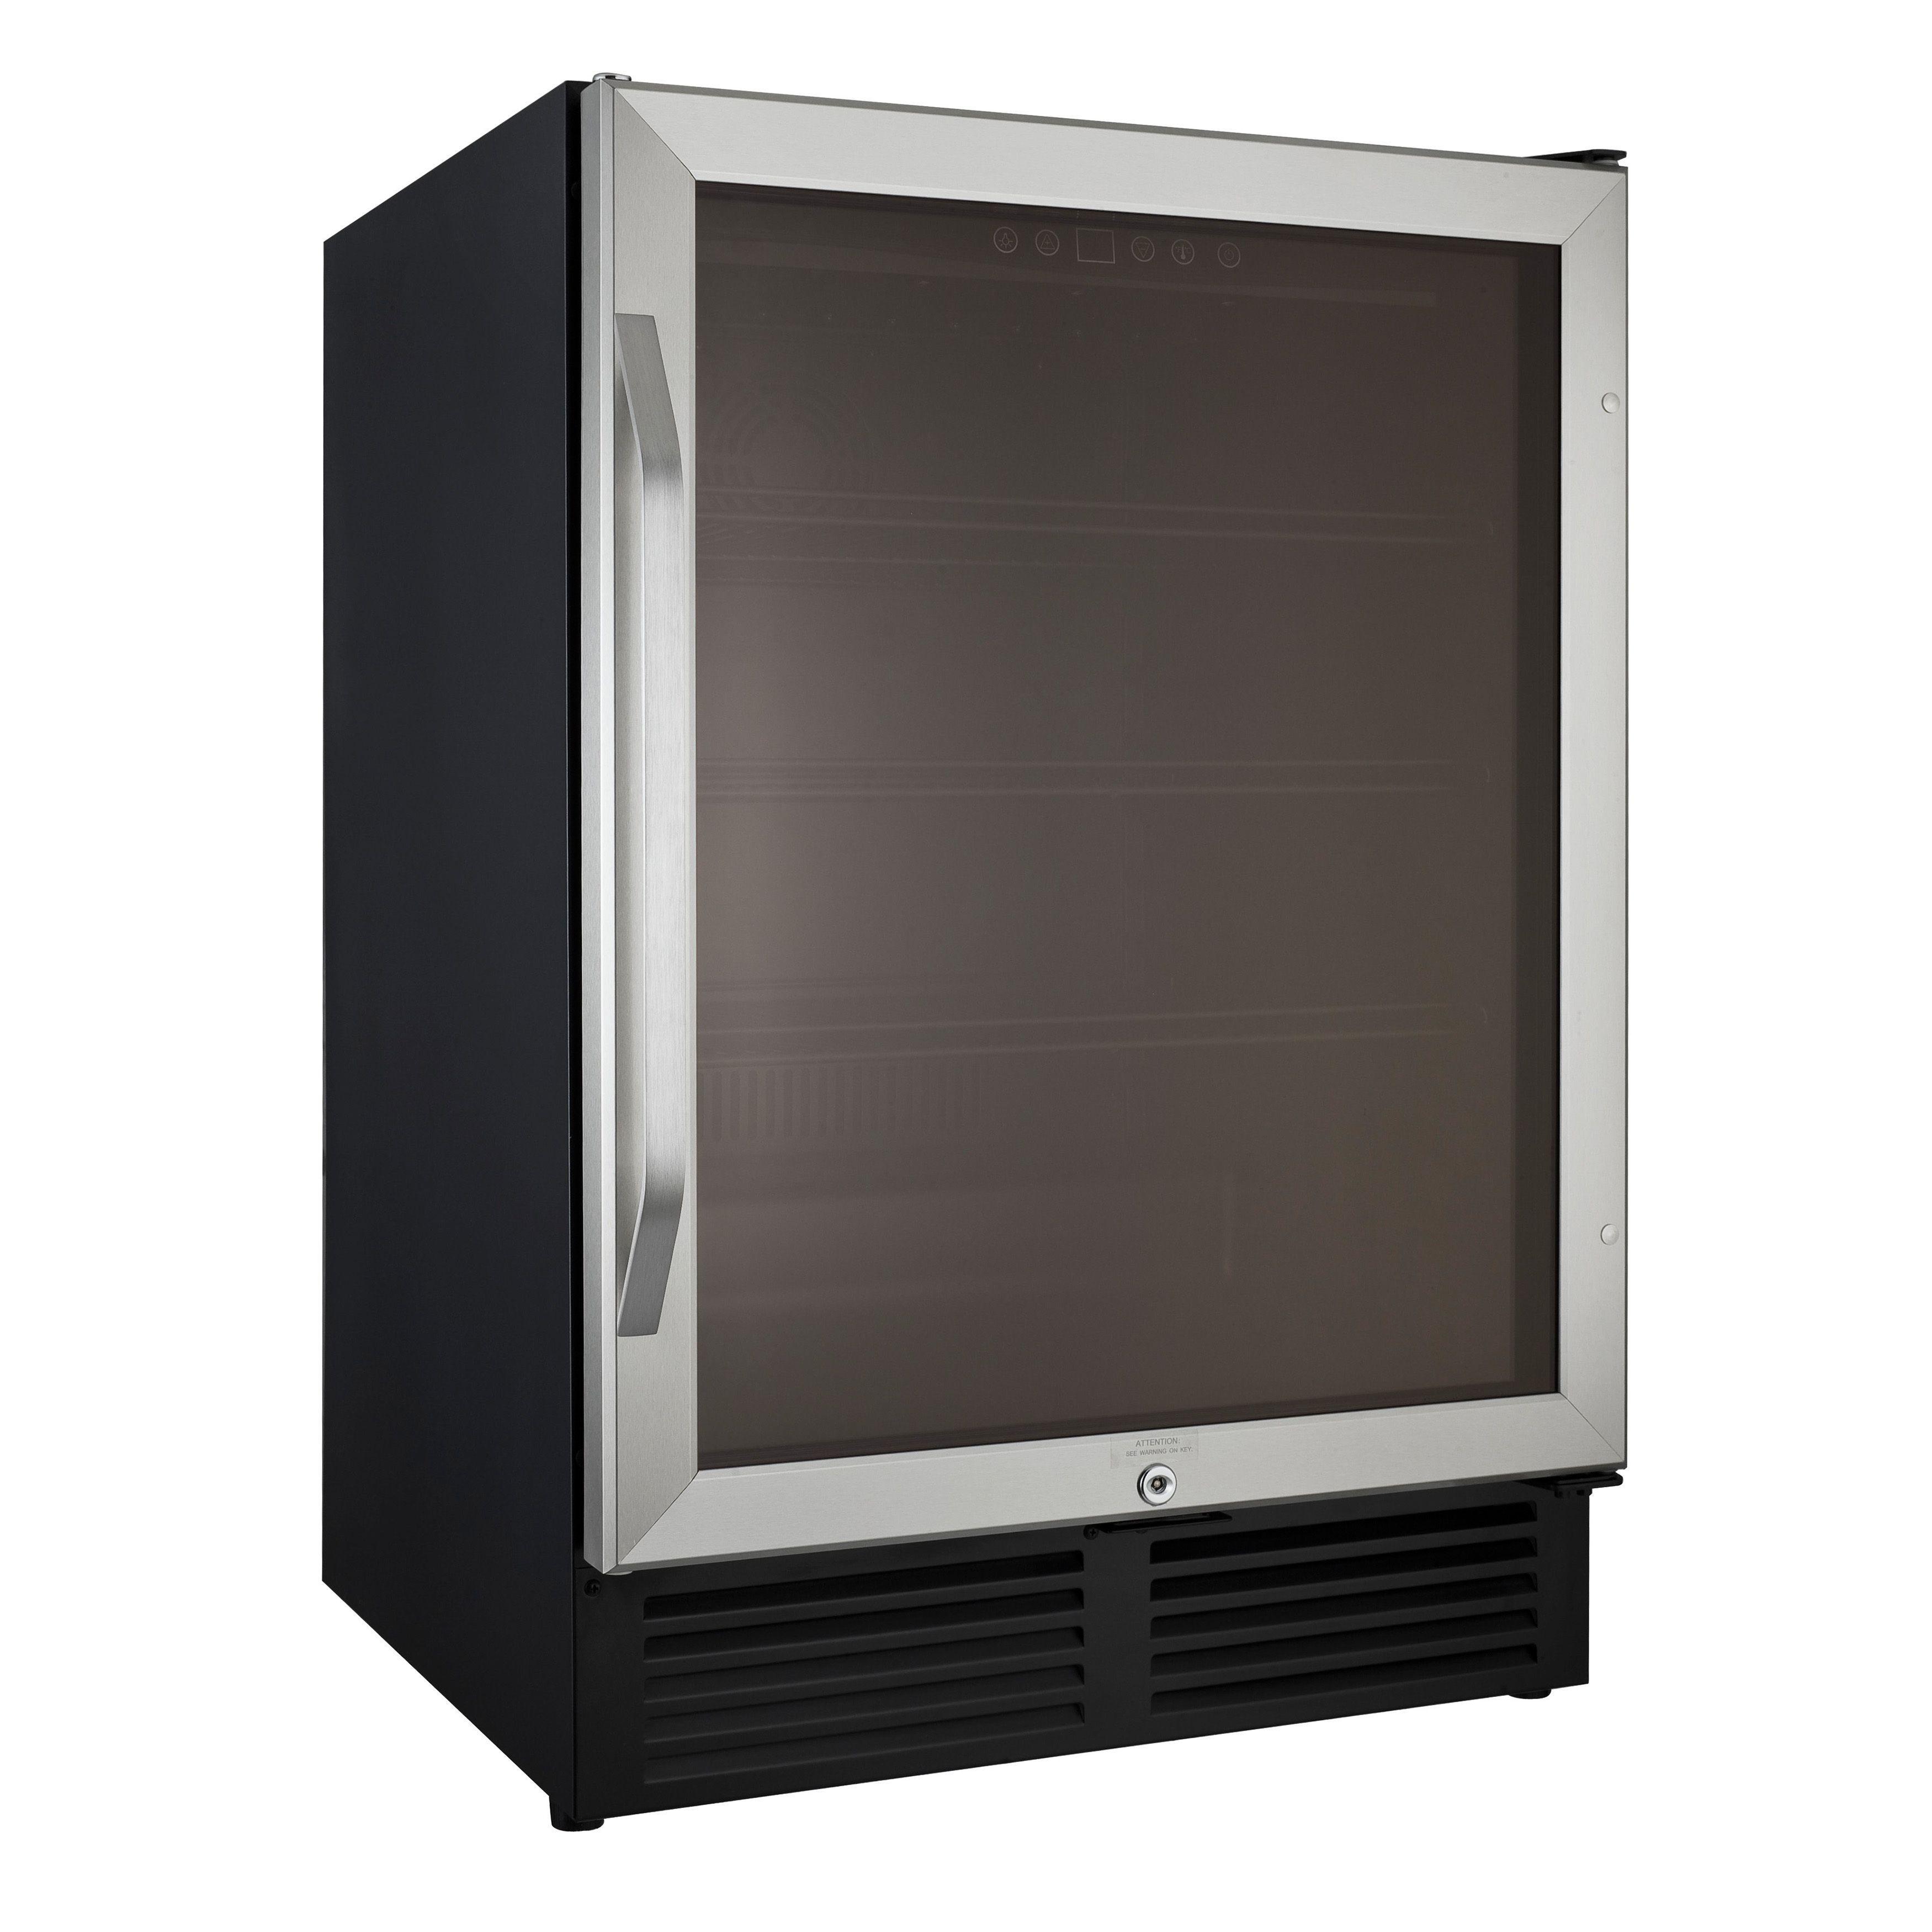 Avanti 5.0 Cubic Foot Glass Door Refrigerator, Silver Stainless Steel (Metal )